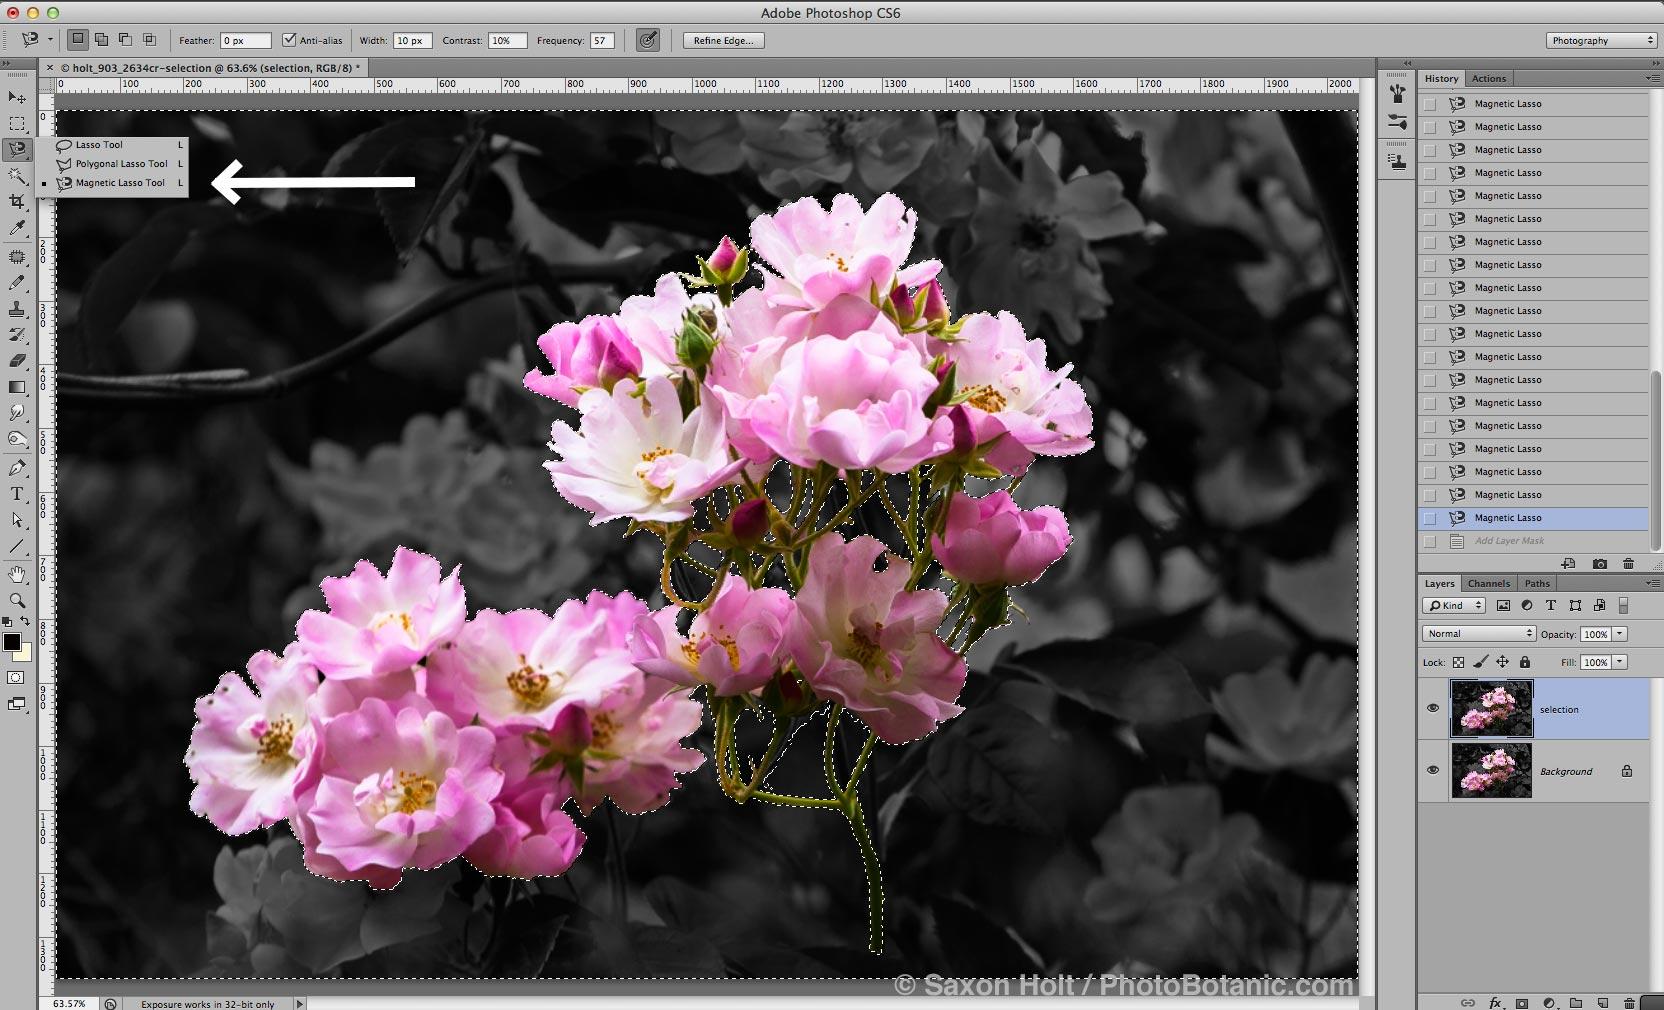 Screenshot -Extraction - Rosa 'Apple Blossom' , Rambler multiflora rose flowering in trees